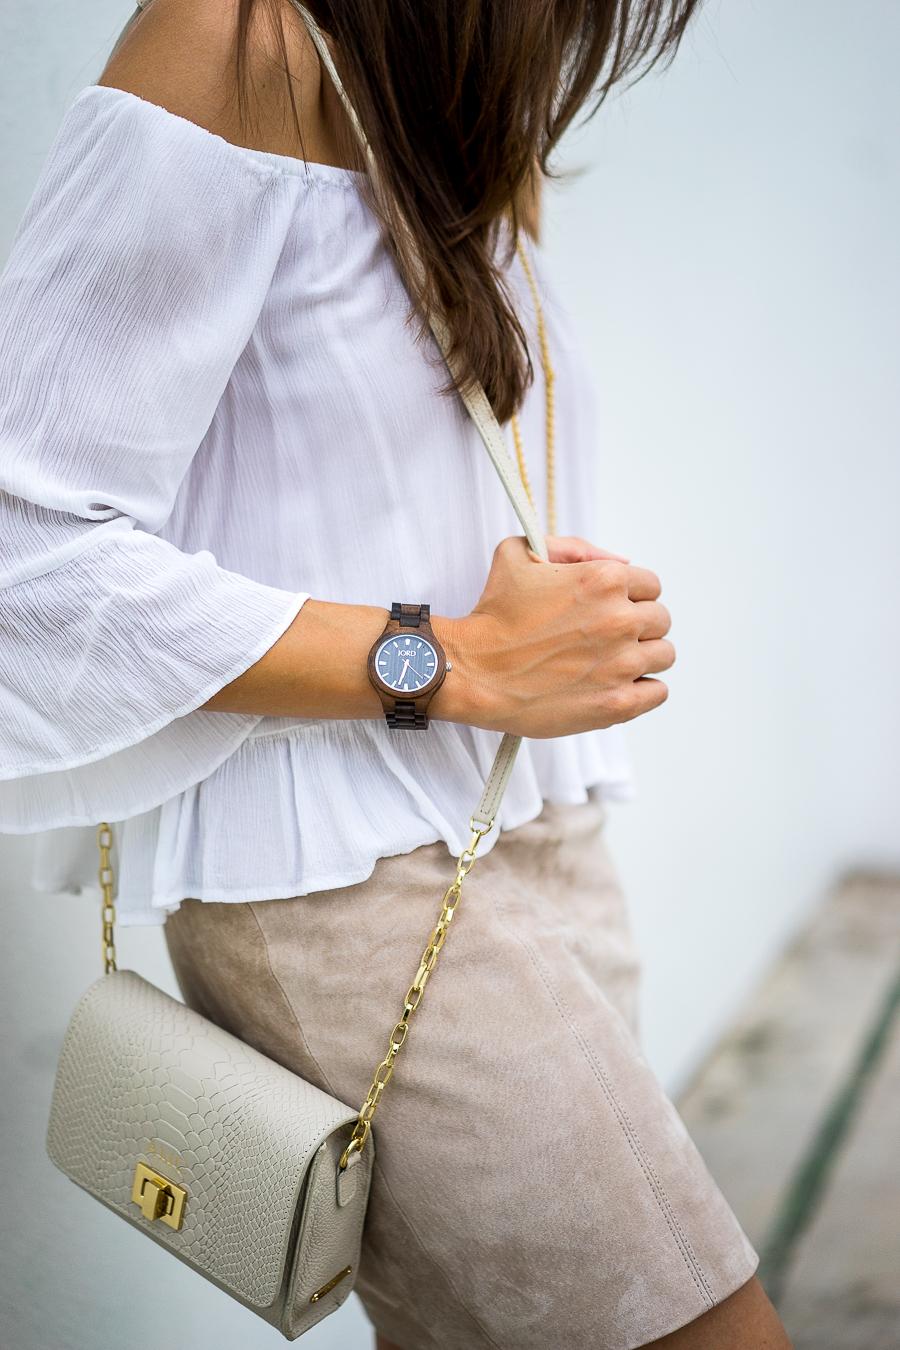 A Glam Lifestyle fashion blogger collaborates with JORD wood watch wearing JORD Fieldcrest dark sandalwood wood watch